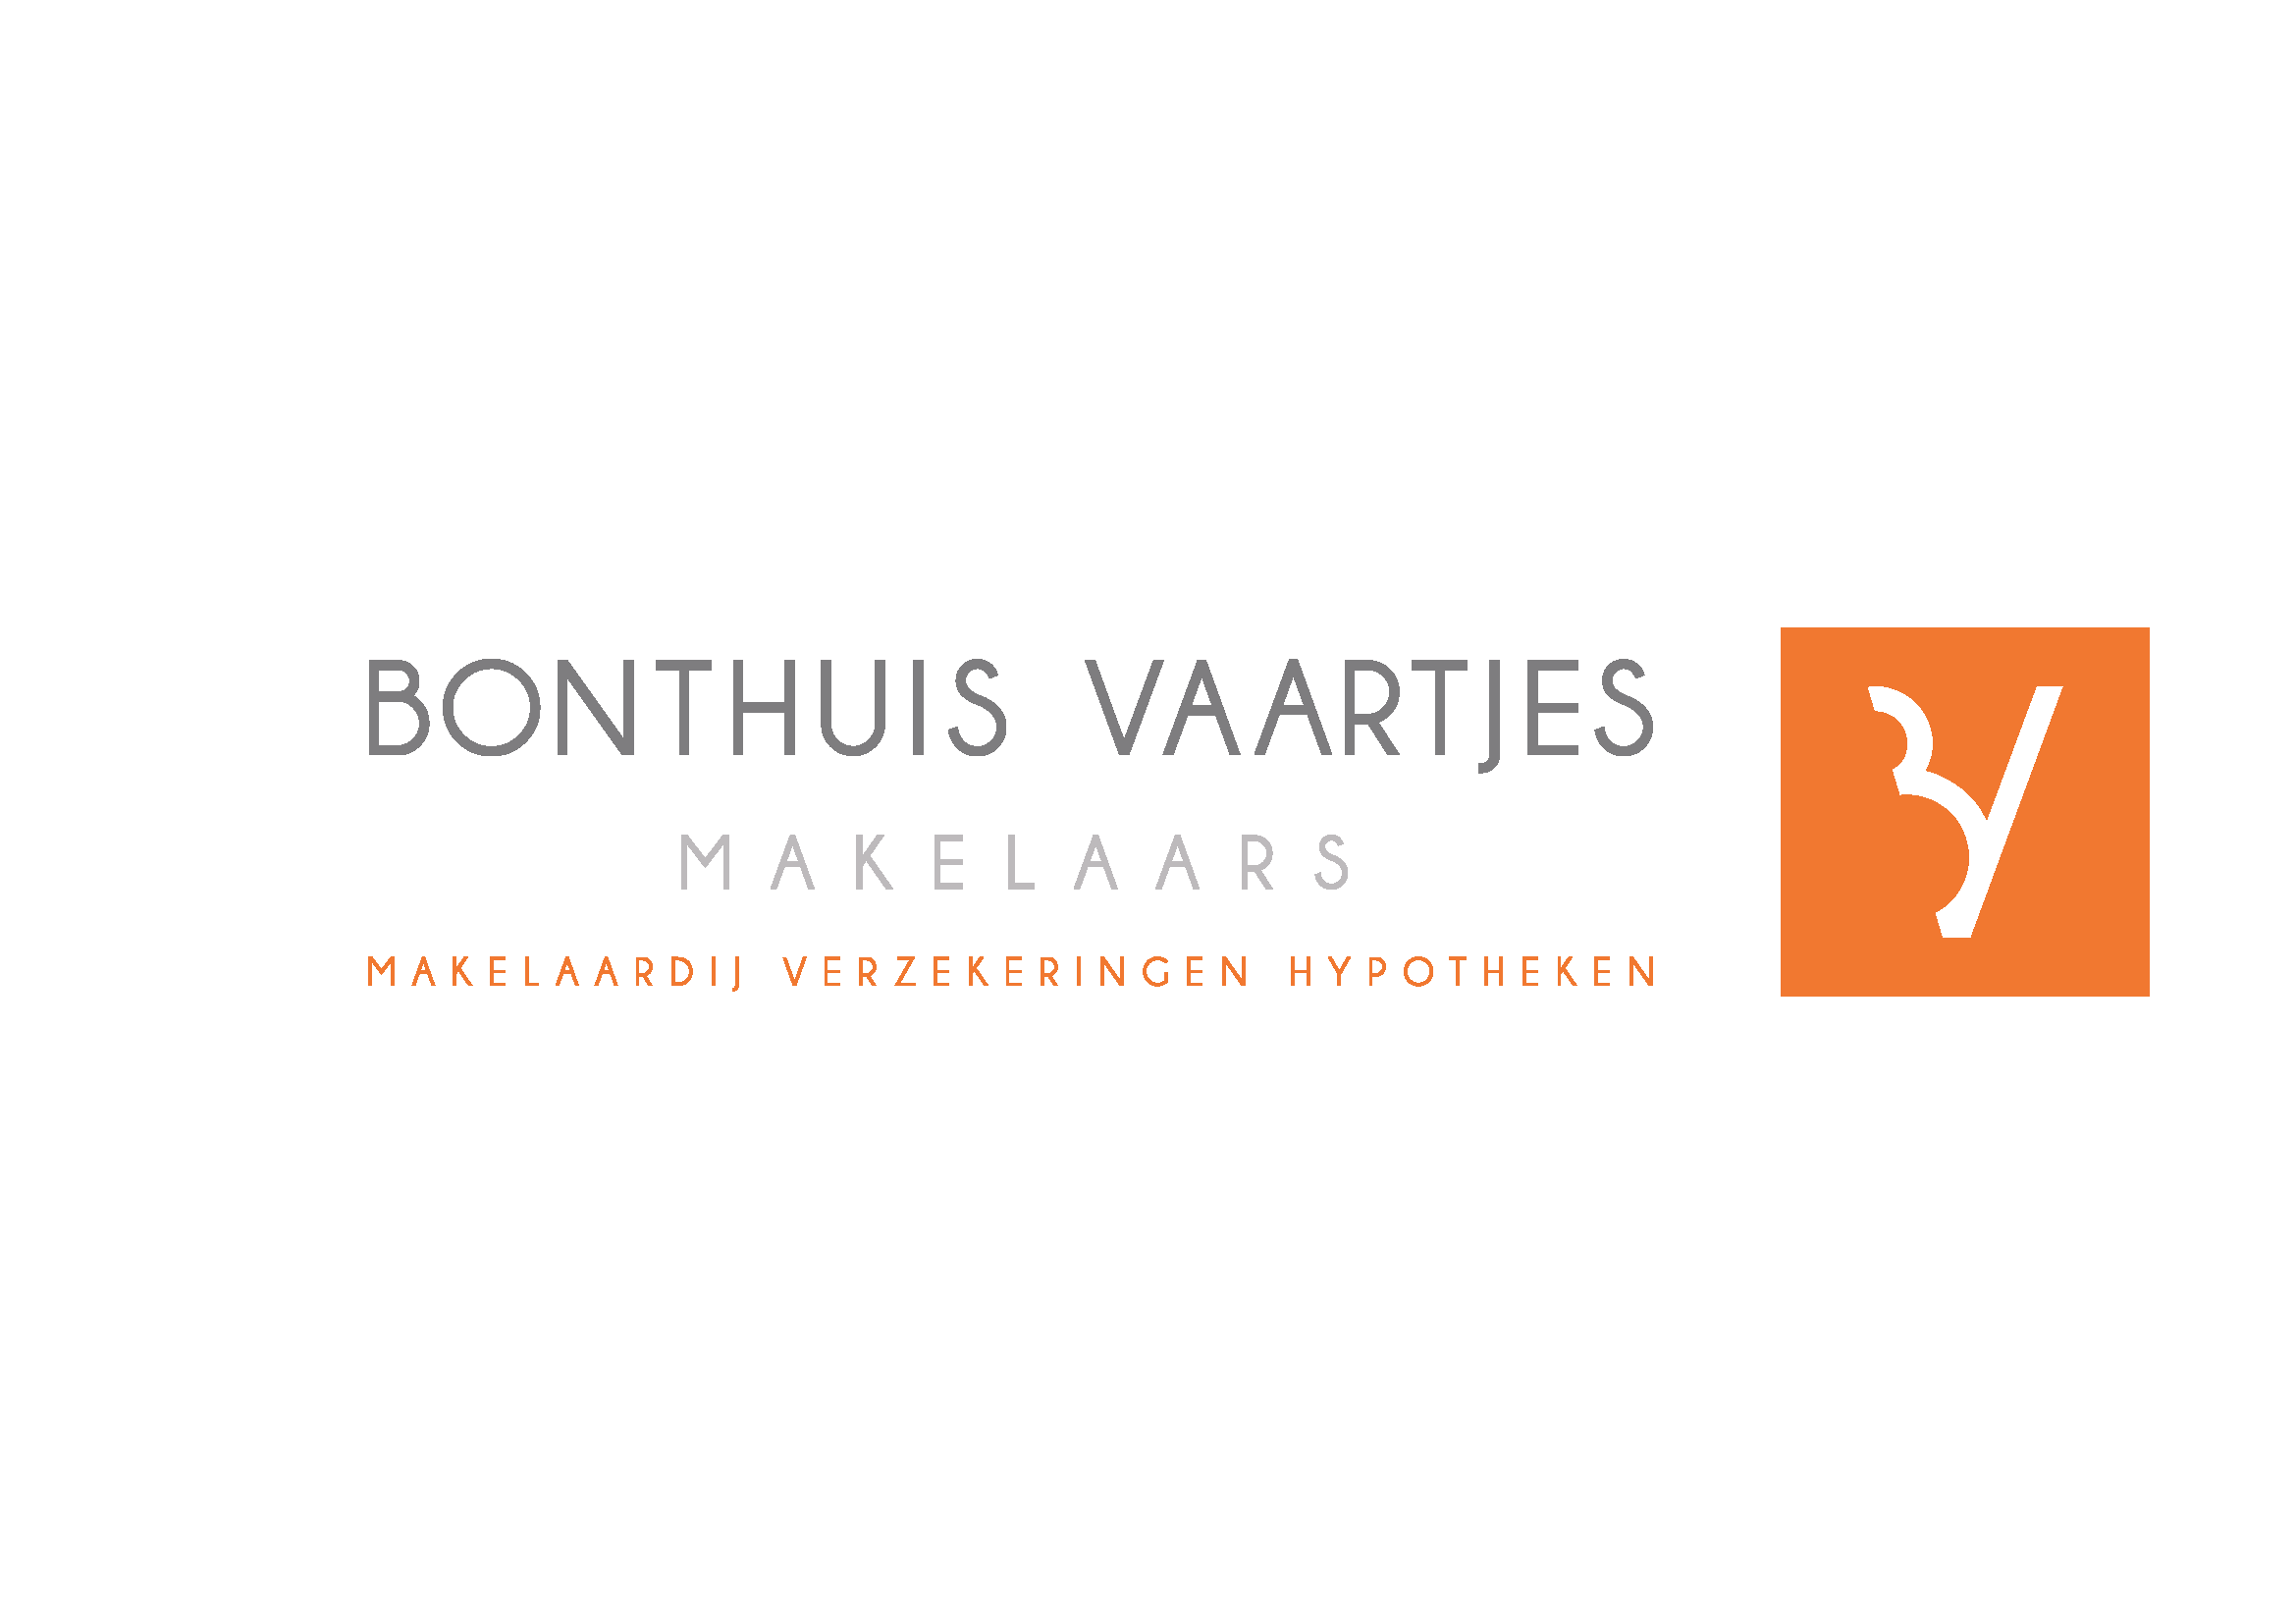 10 BonthuisVaartjes - logo